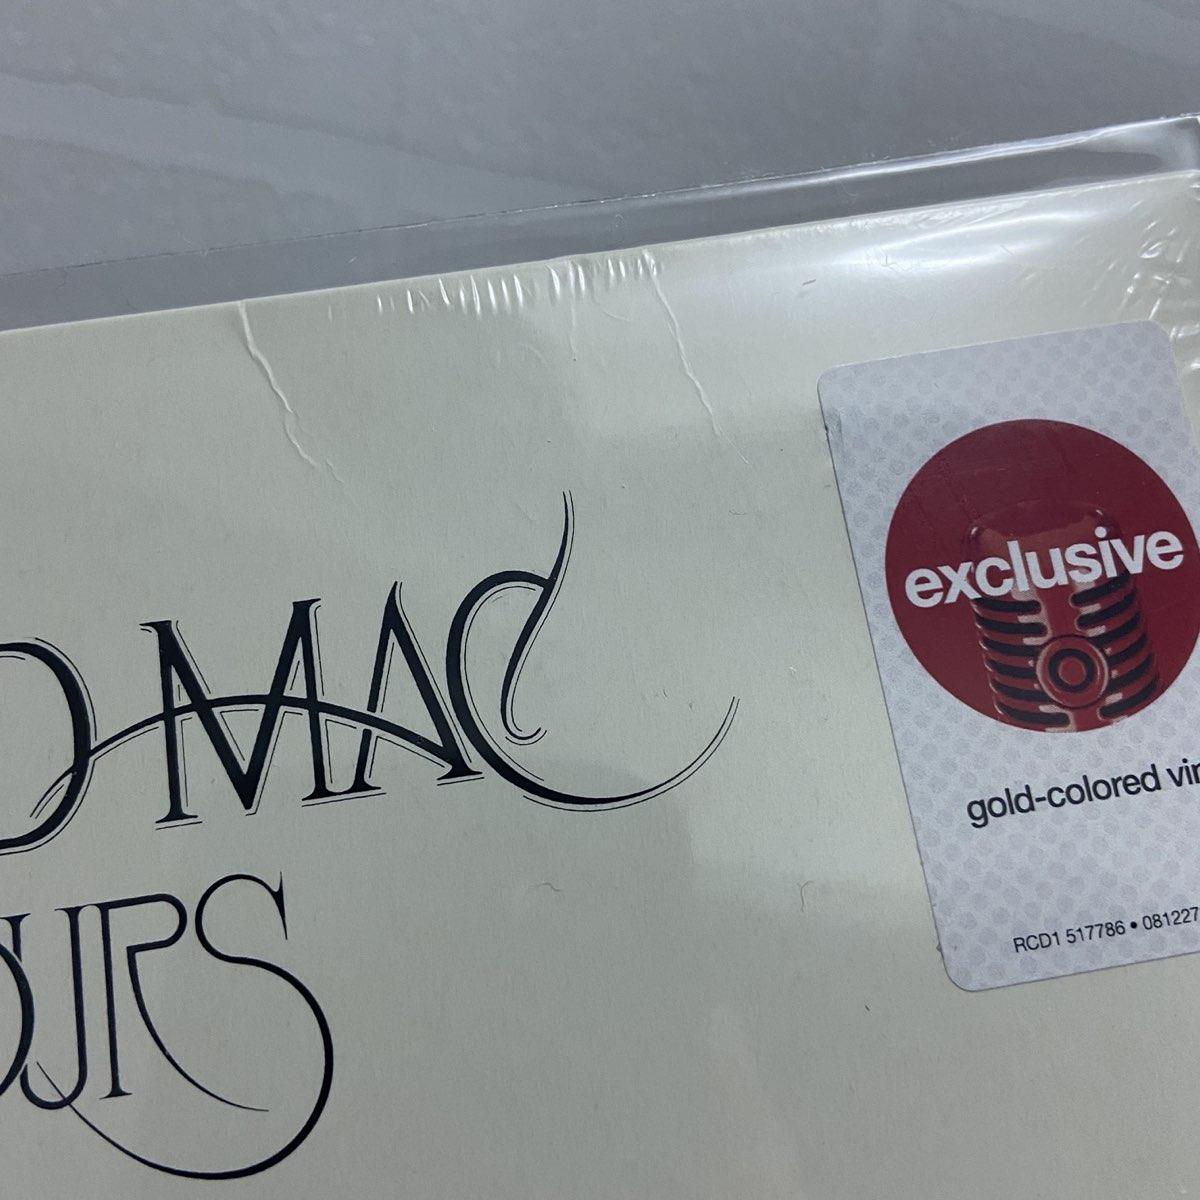 OUTLET - Fleetwood Mac - Rumours [Target Exclusive, Vinyl] [Gold Colored] - AVARIA - LEIA A DESCRIÇÃO